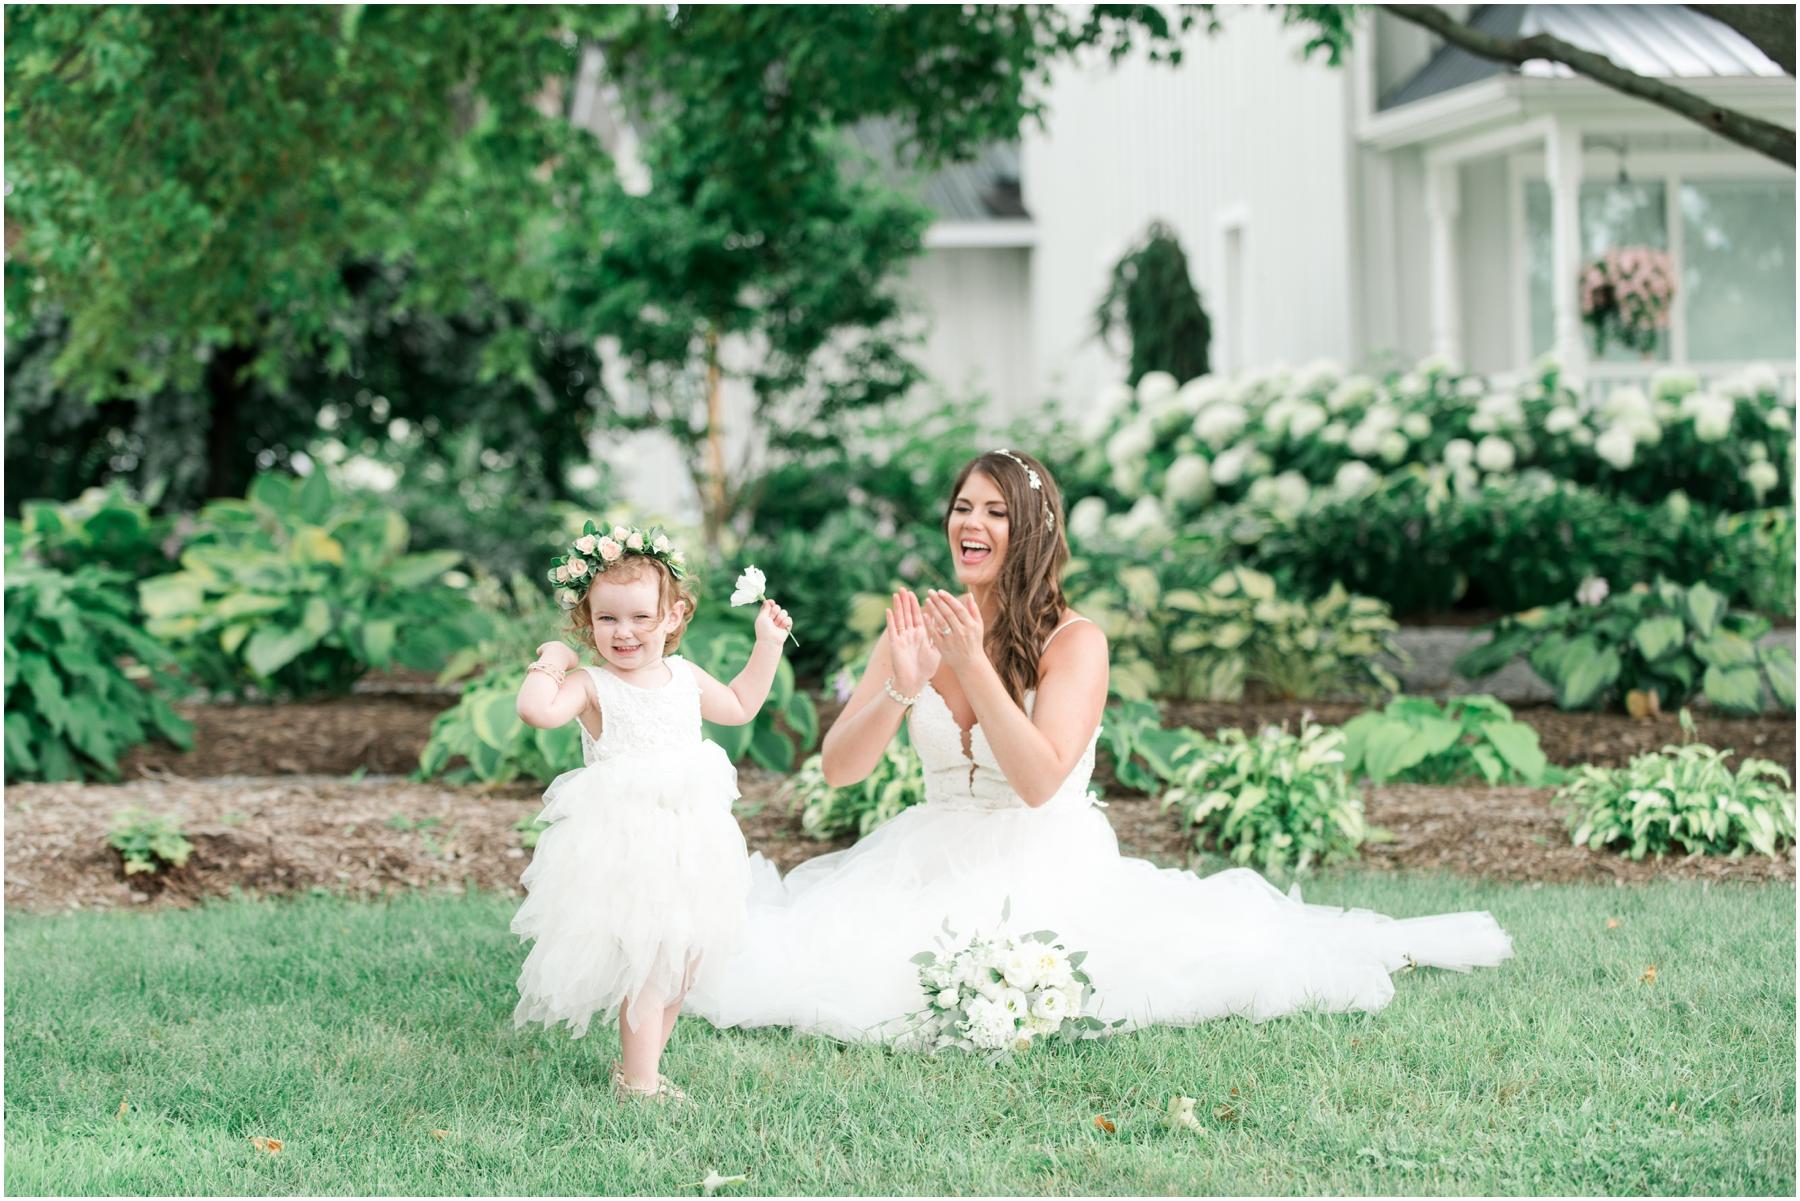 Bloom Field Gardens Wedding Precious Photography_0346